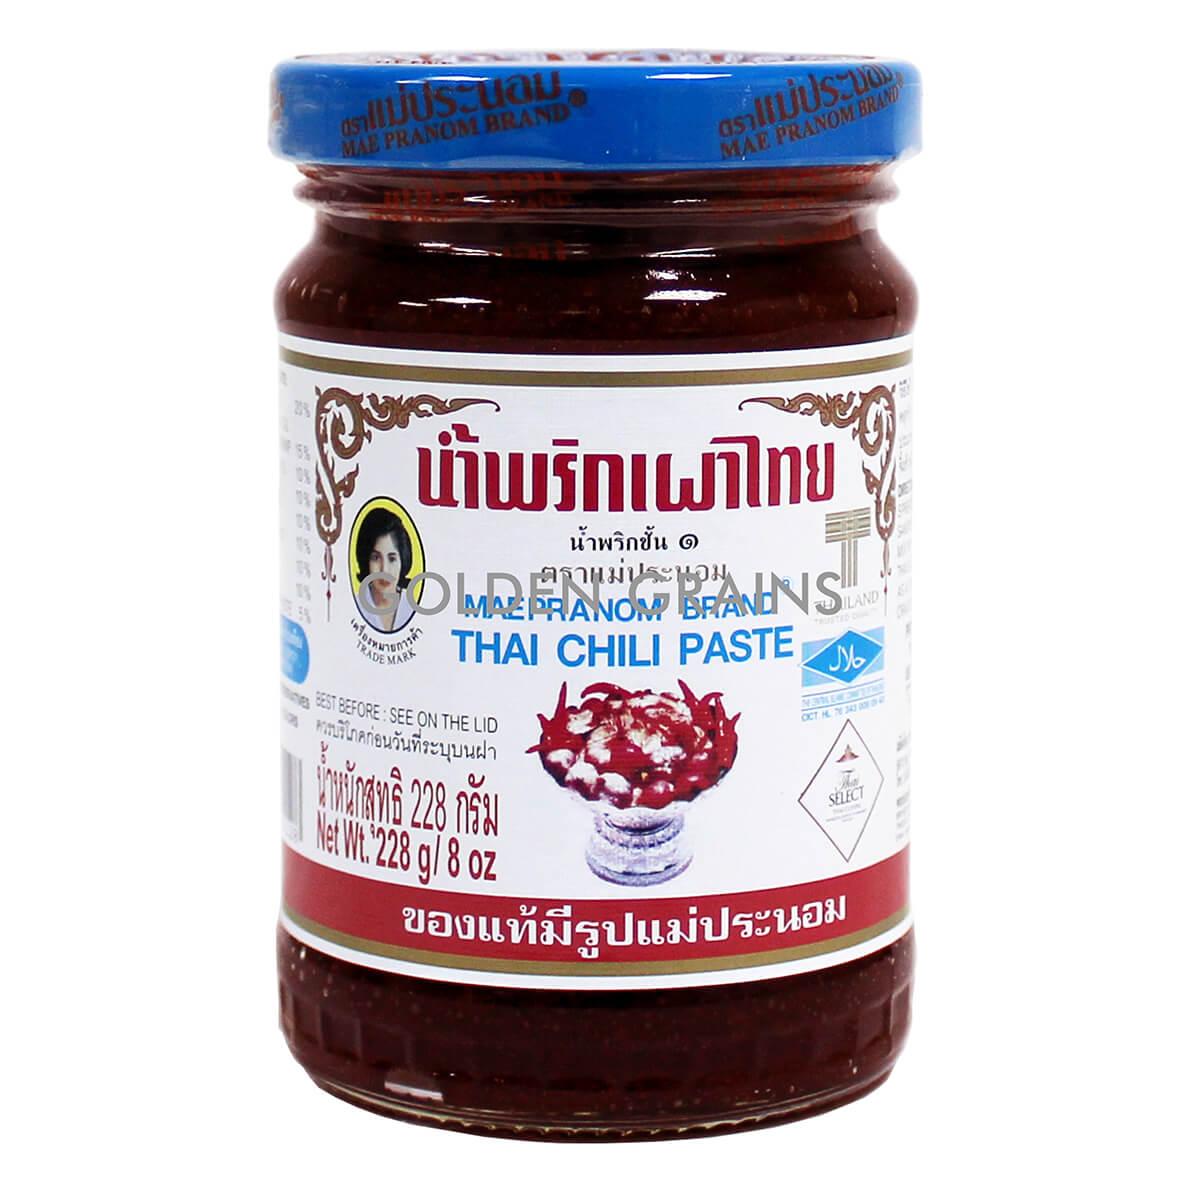 Golden Grains Dubai Export - Maepranom Brand - Thai Chili Paste - Front.jpg